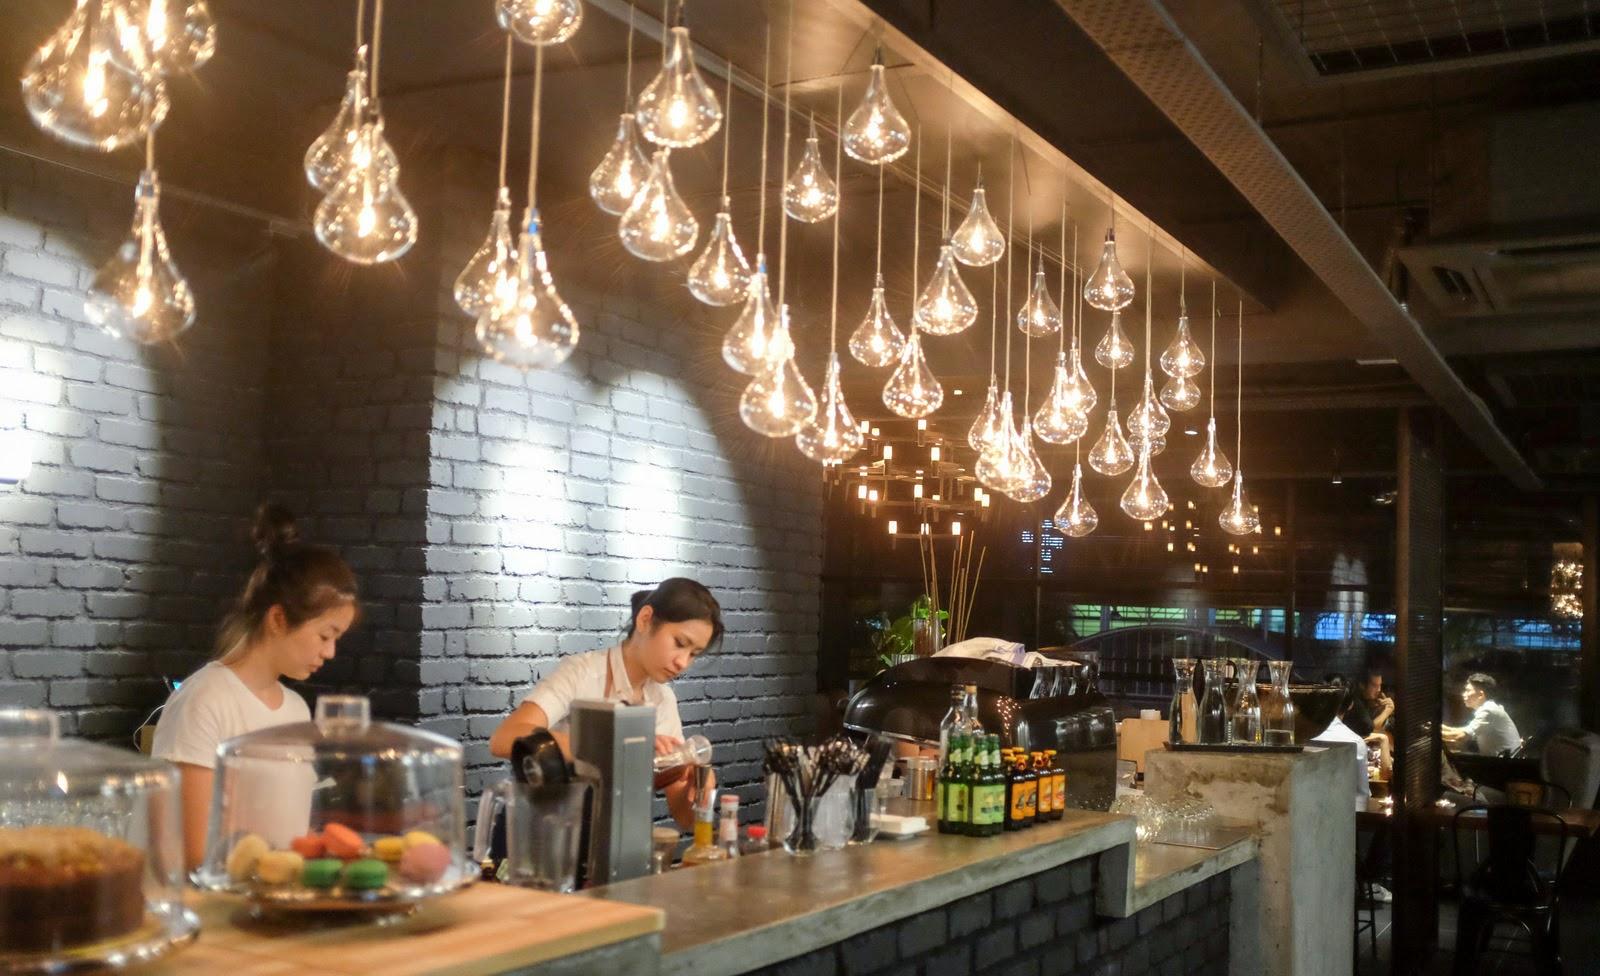 Eat drink kl olfactory bulb kota damansara for Food bar kota damansara